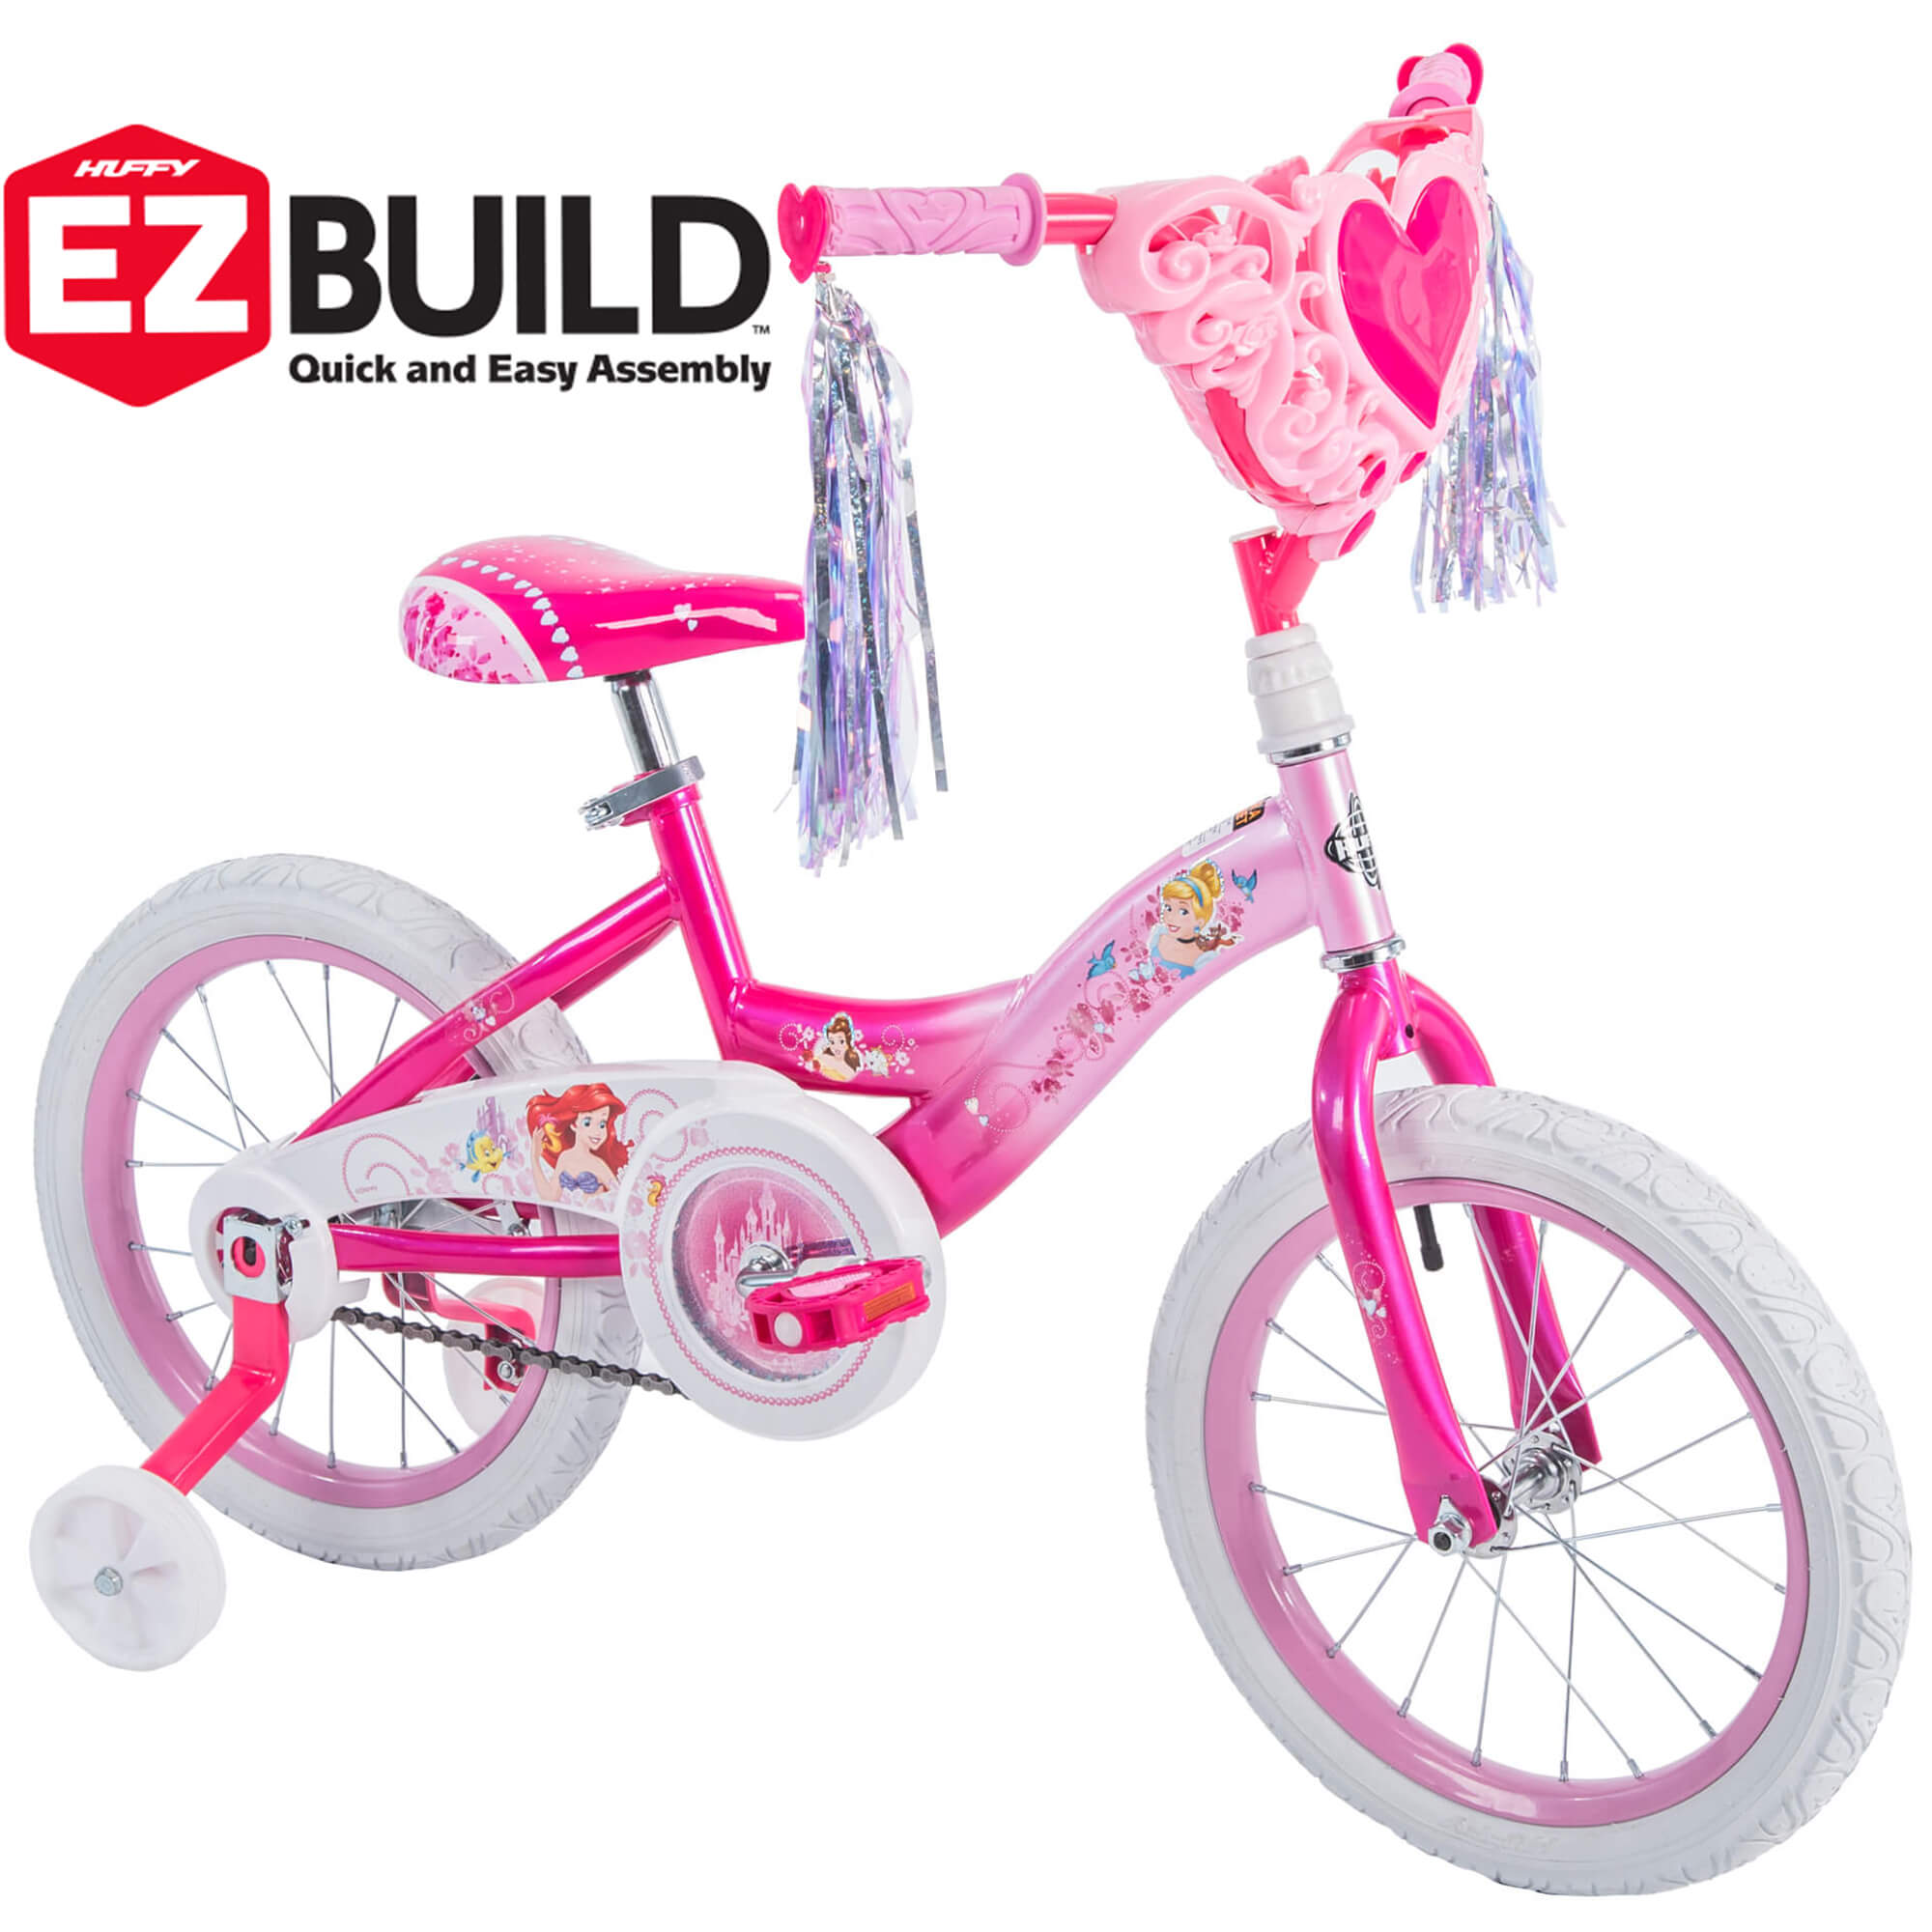 "Disney Princess 16"" Girls' EZ Build Pink Bike, by Huffy"